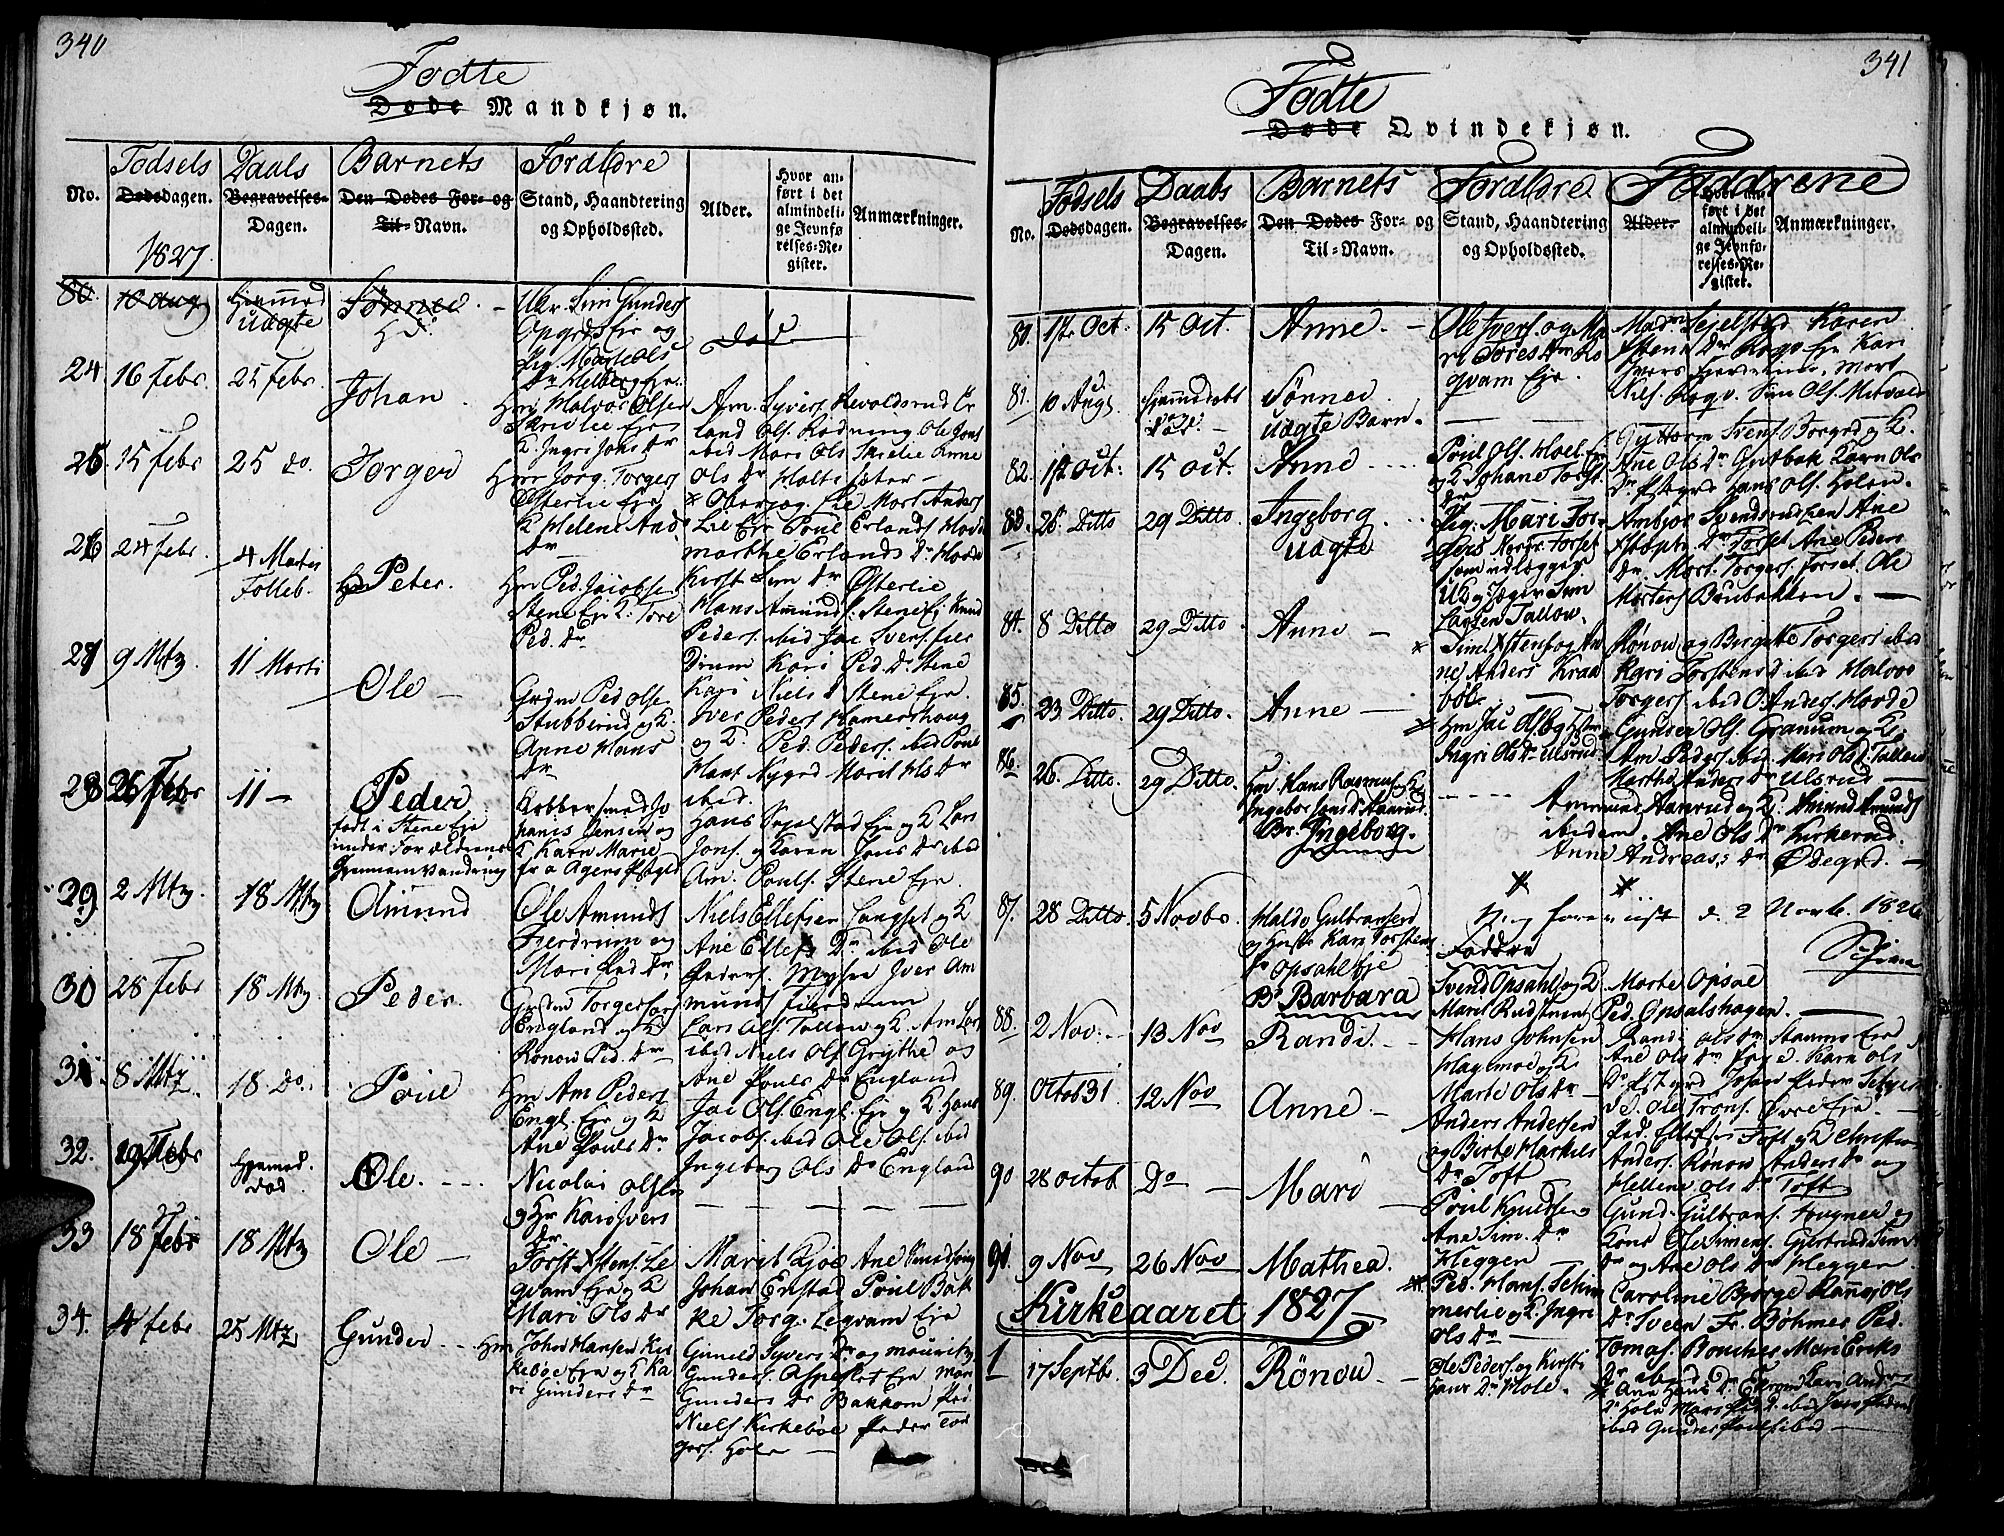 SAH, Gausdal prestekontor, Ministerialbok nr. 5, 1817-1829, s. 340-341